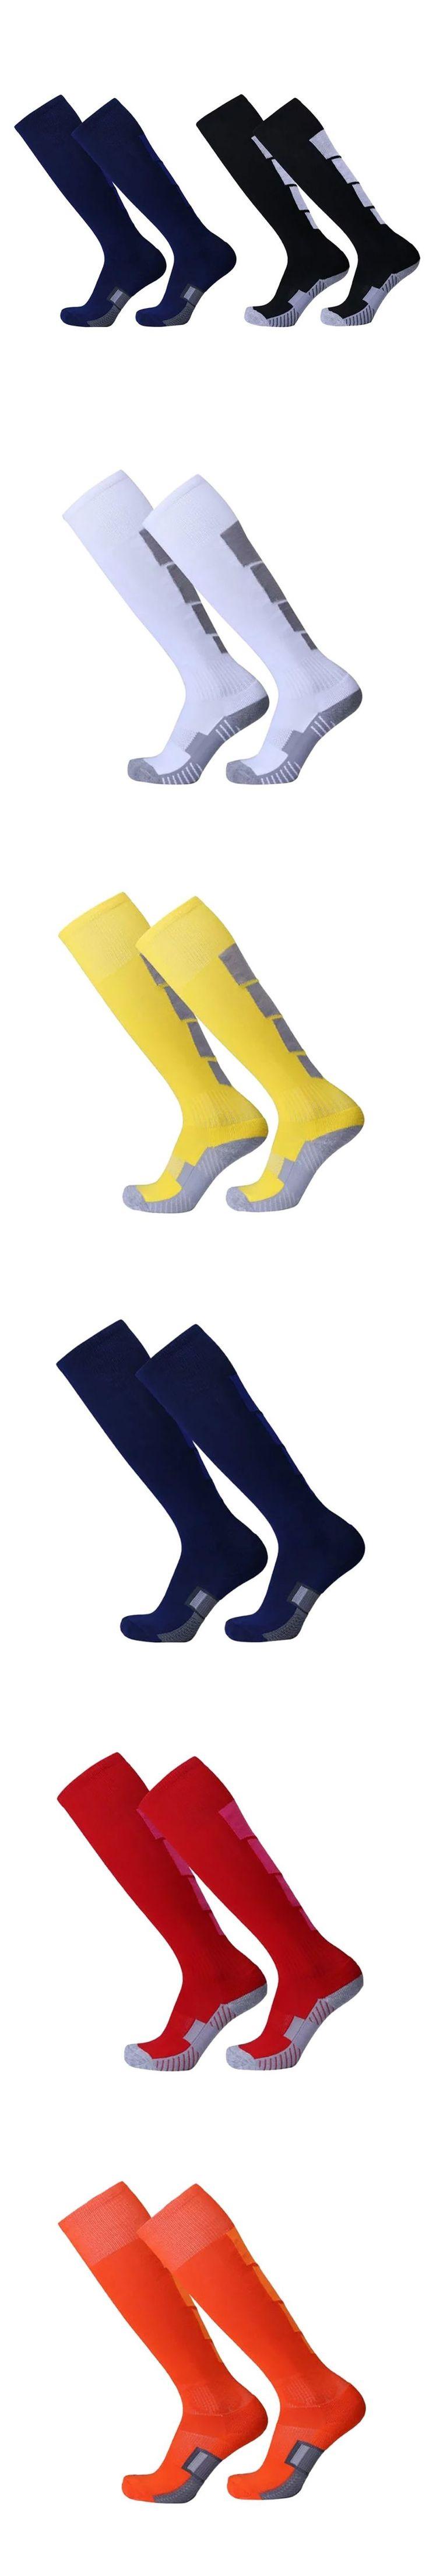 Leg Compression Men Ankle Socks Stretch Comfortable Relief Soft Socks Plain Long Socks Cotton Over Knee High Sock